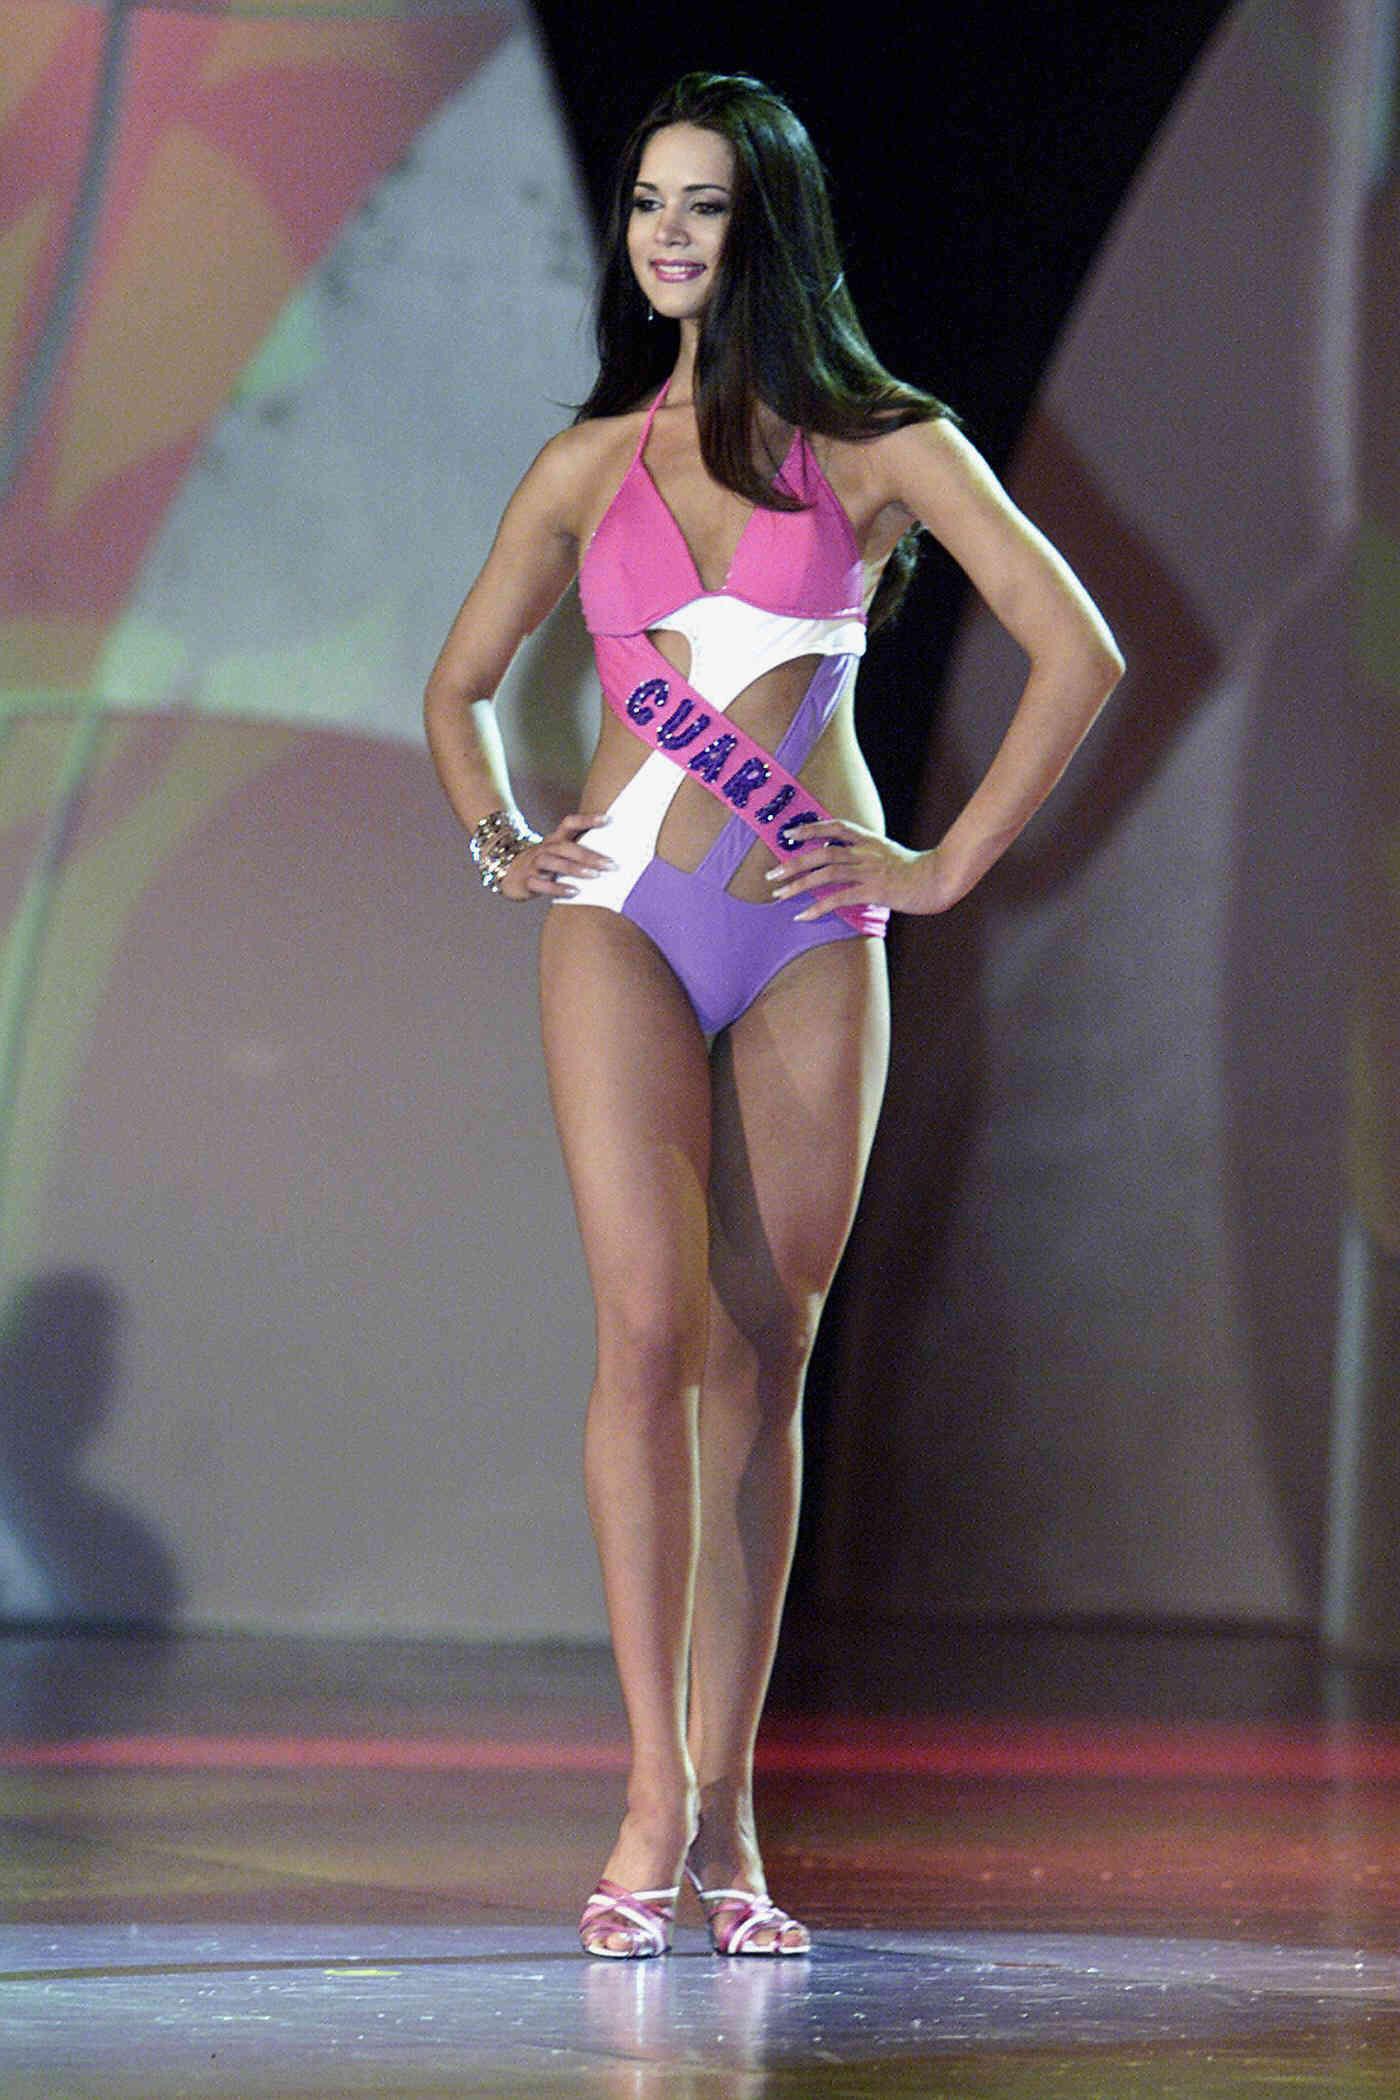 monica spear, top 5 de miss universe 2005. † Monica13